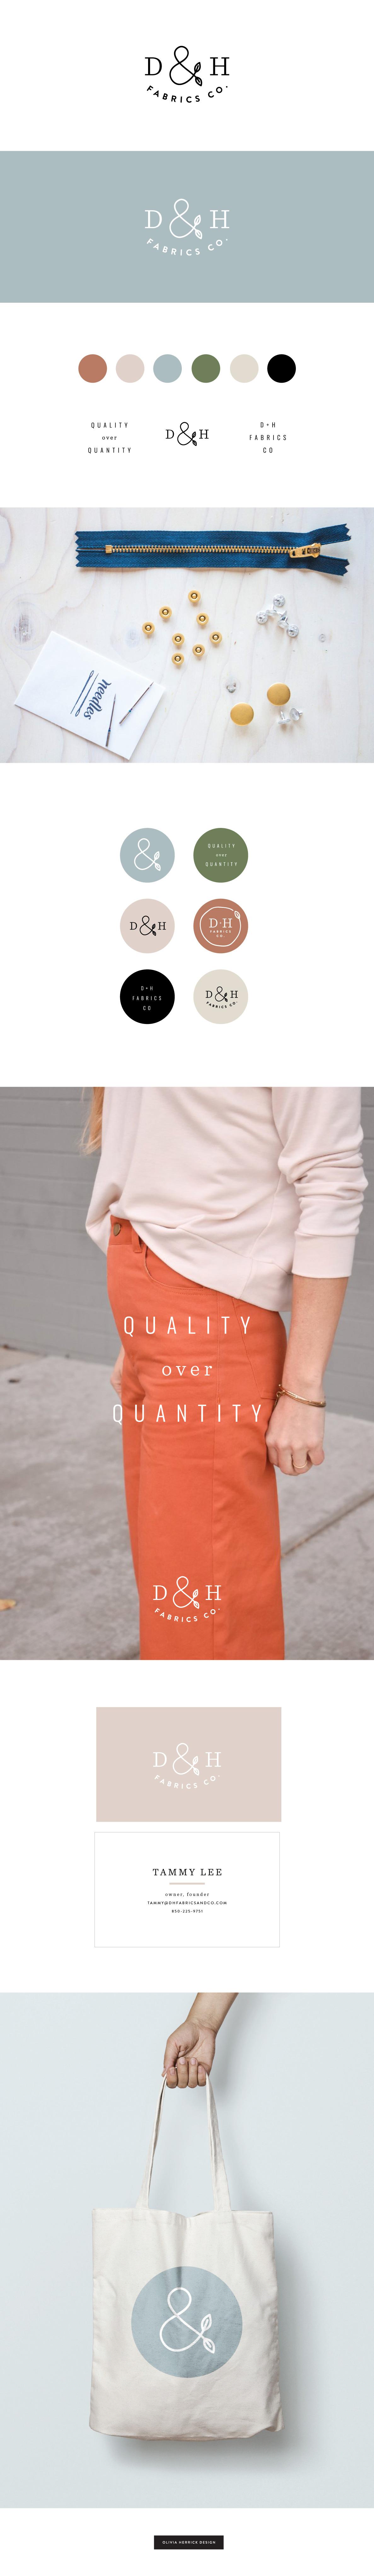 d-h-fabrics-co-olivia-herrick-design.jpg